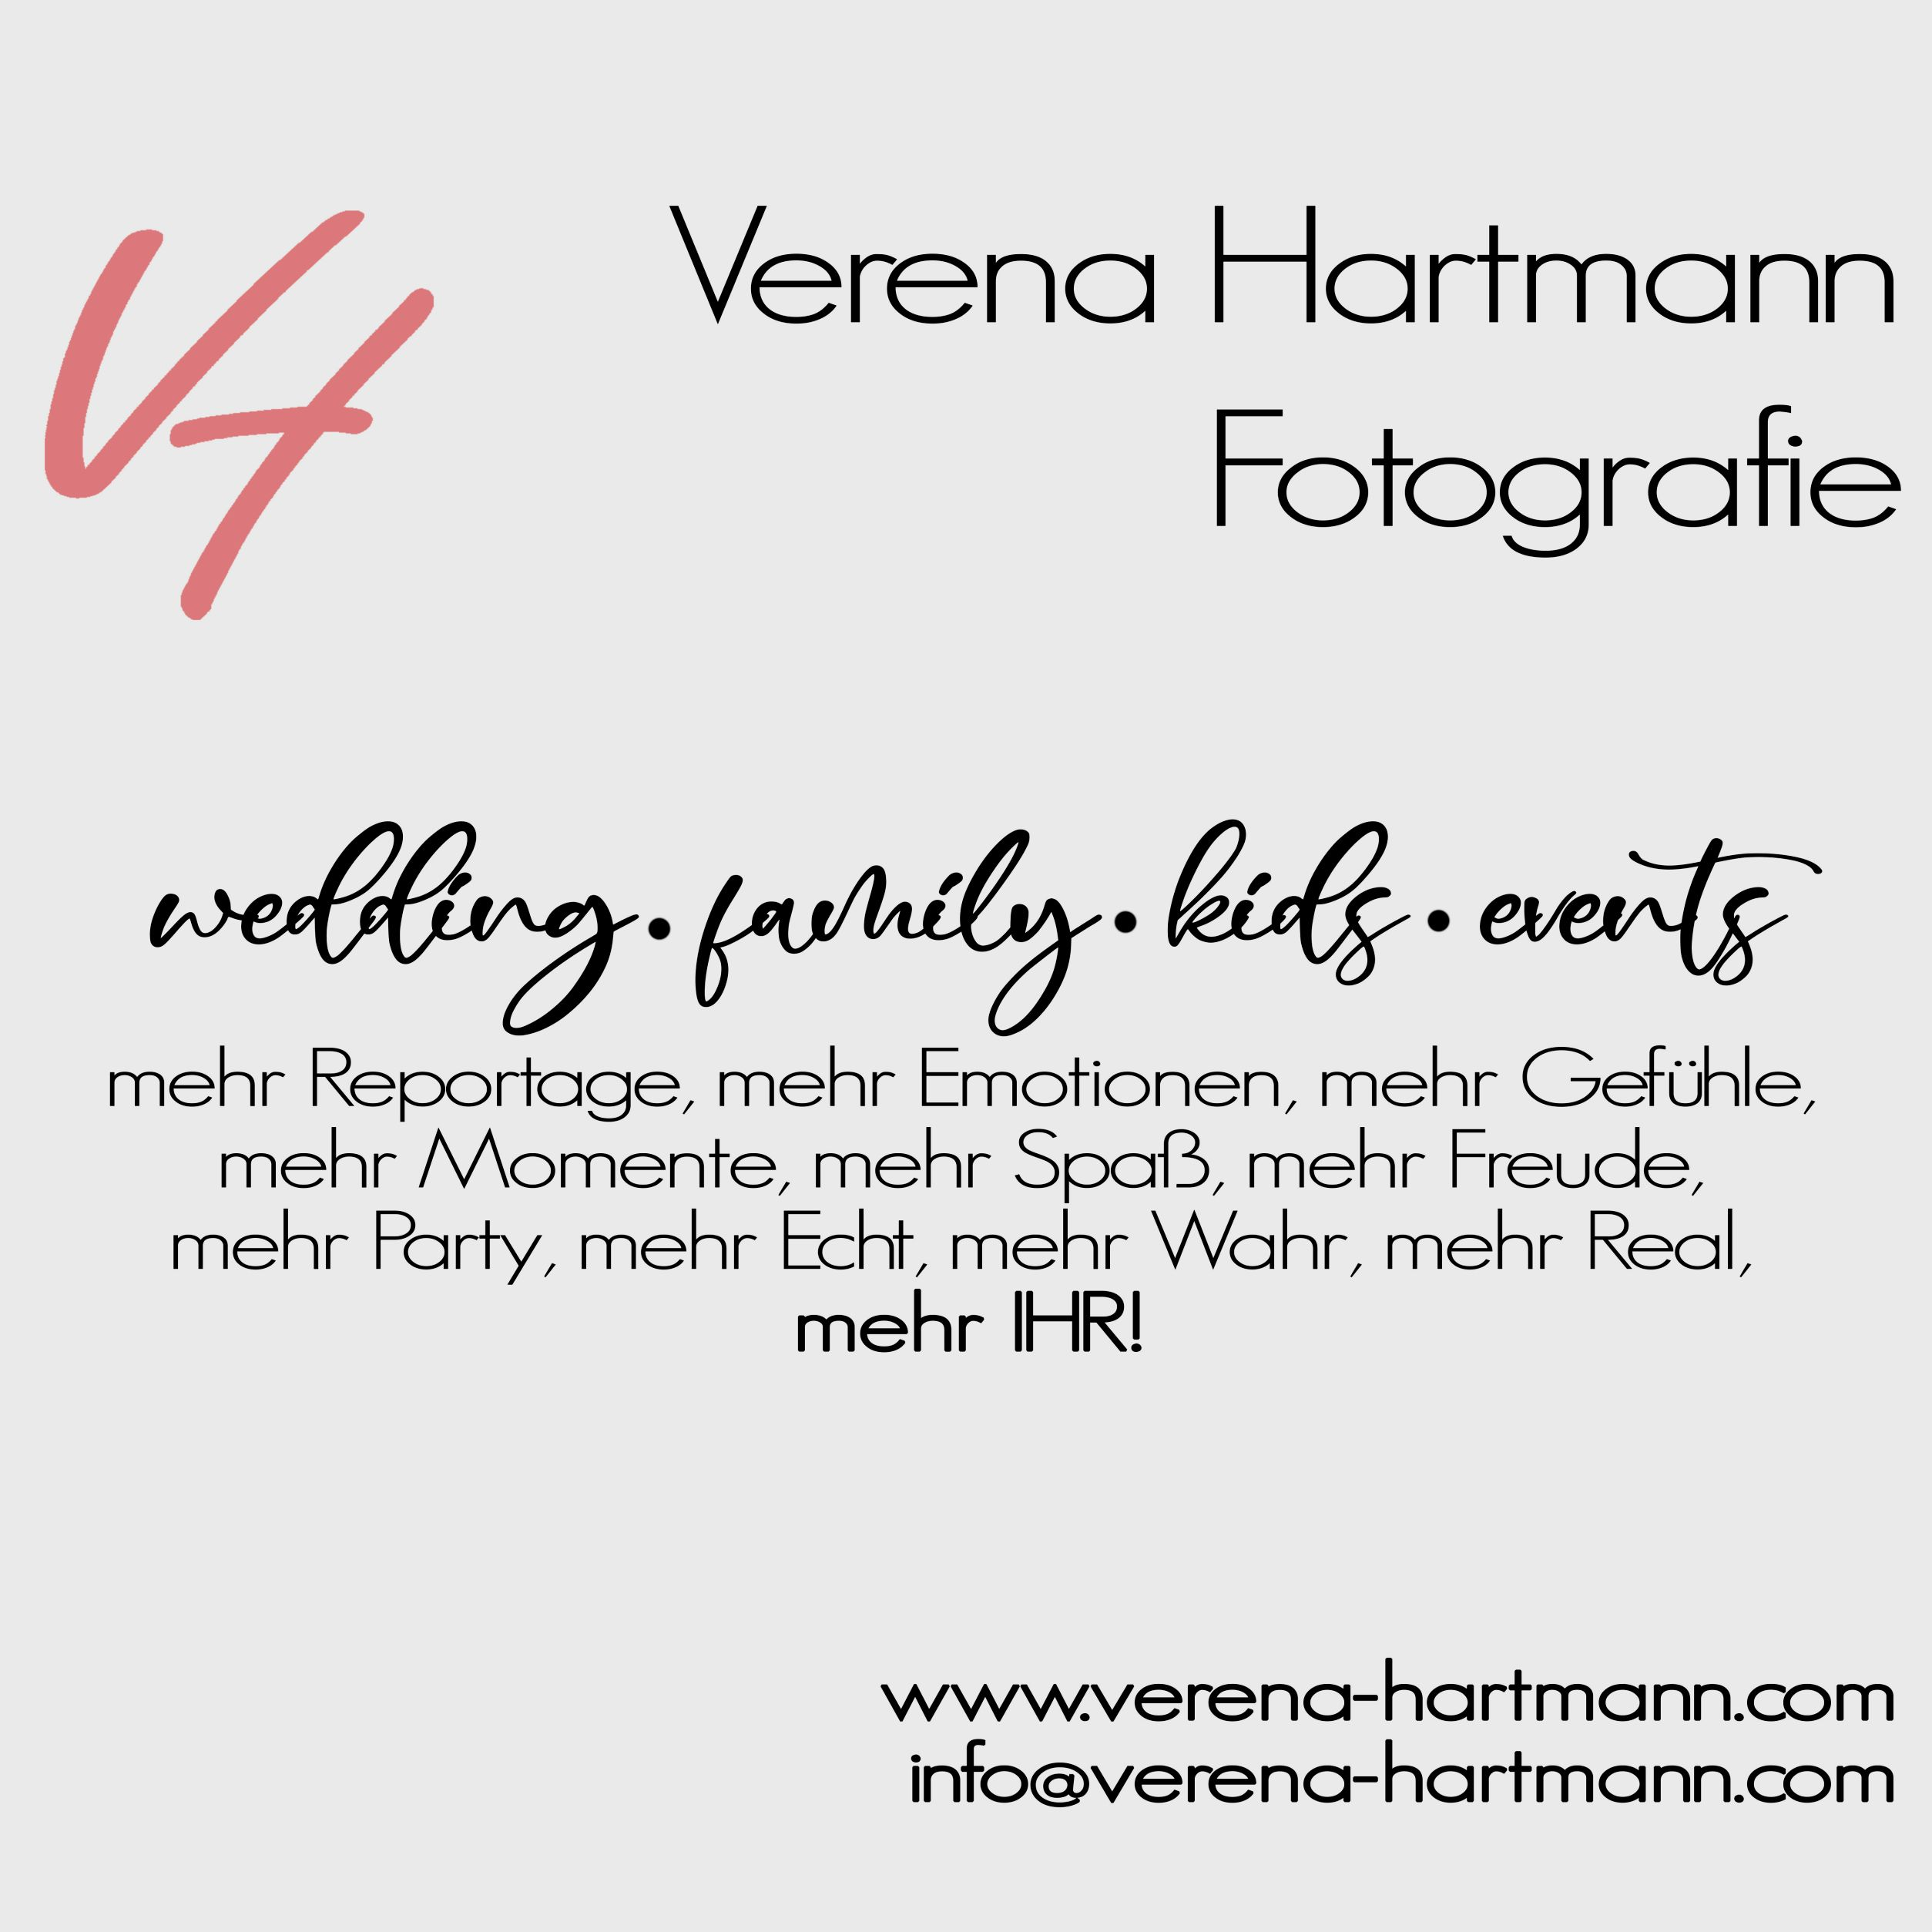 Verena Hartmann Fotografie